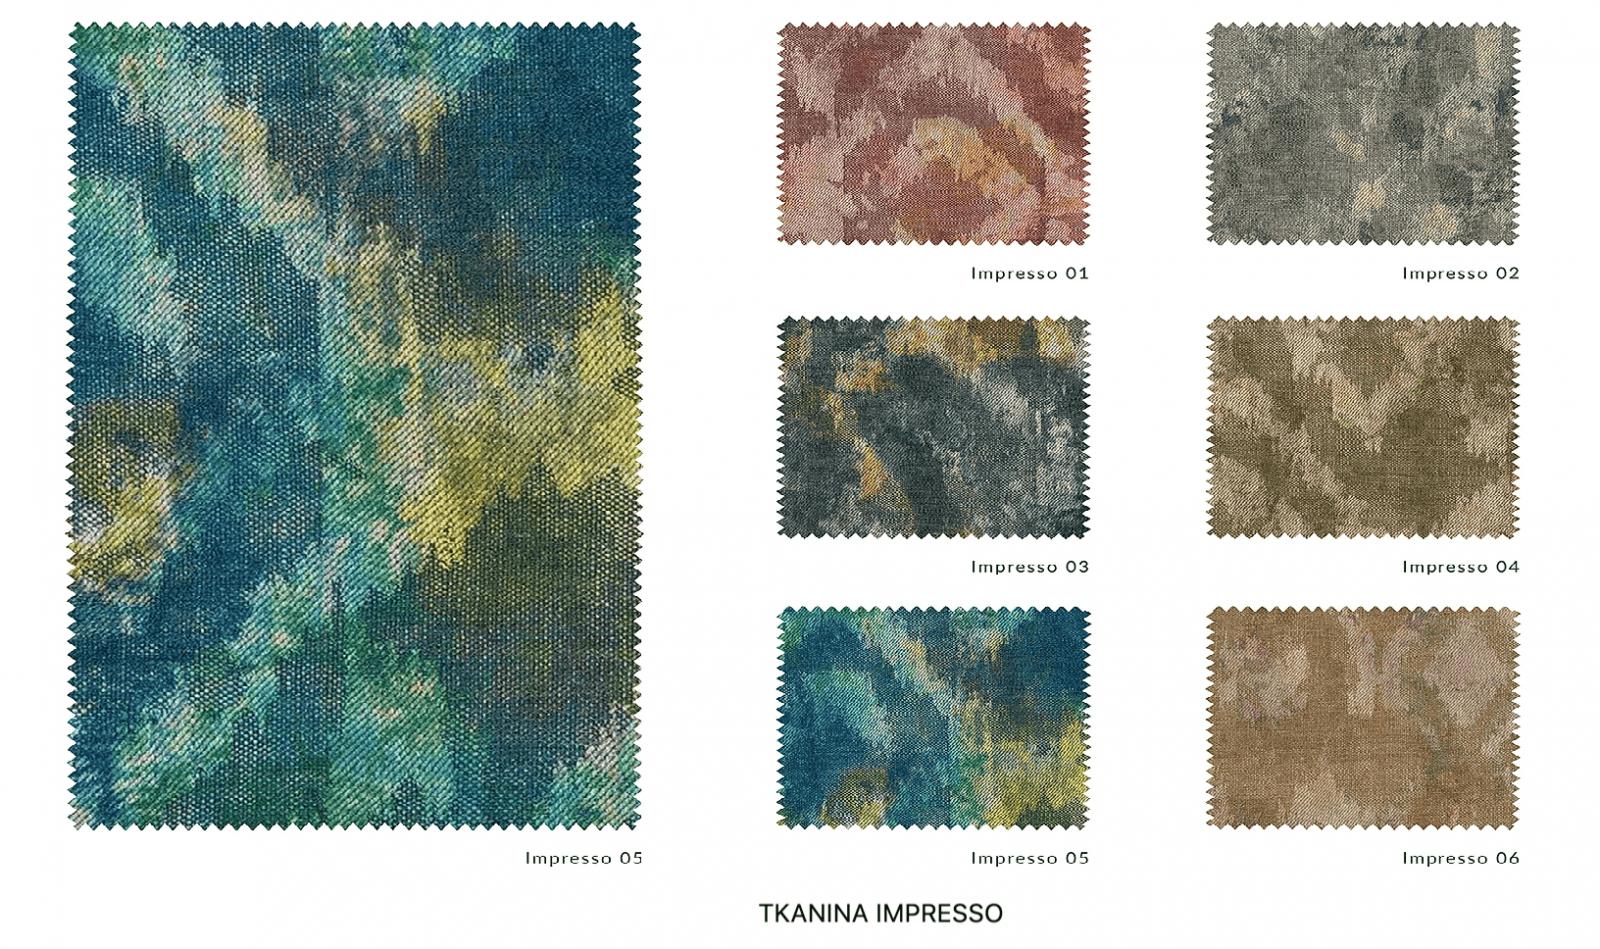 tkaniny impresso